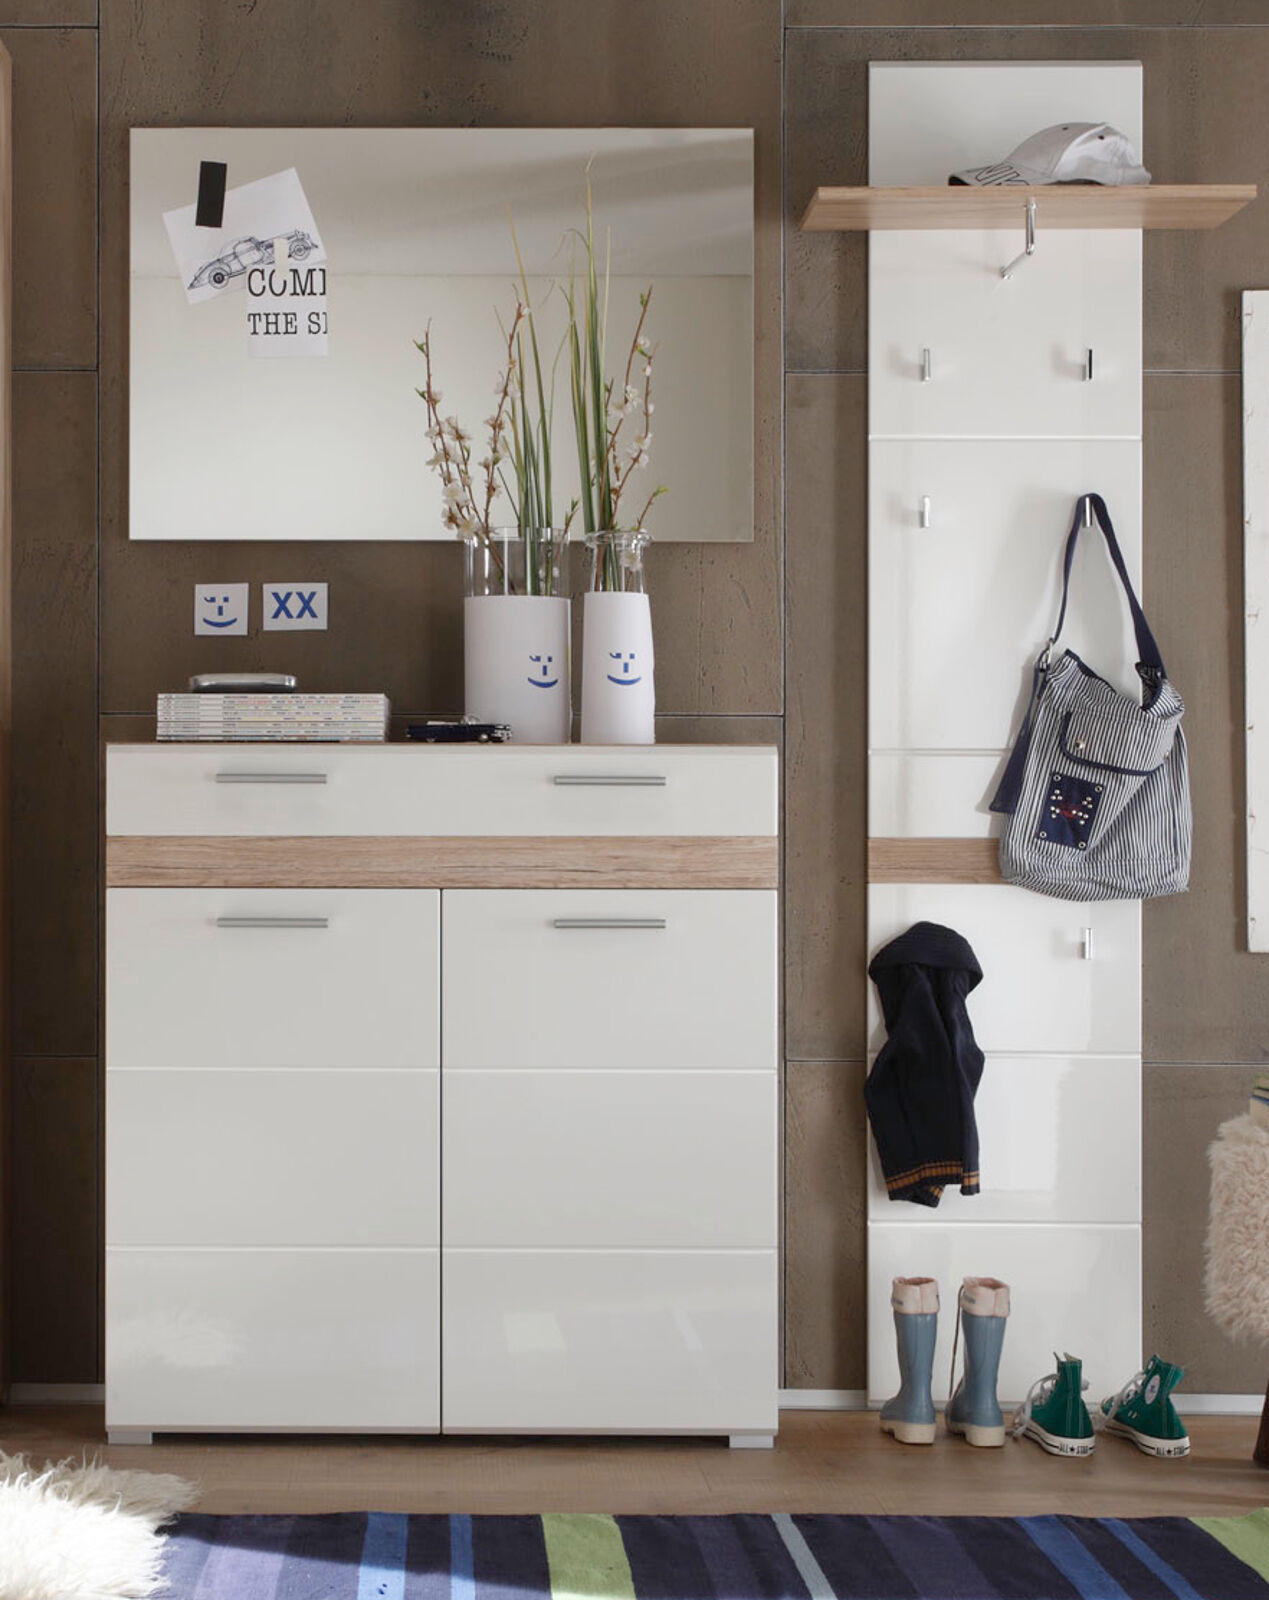 paneele mehr als 10000 angebote fotos preise seite 16. Black Bedroom Furniture Sets. Home Design Ideas